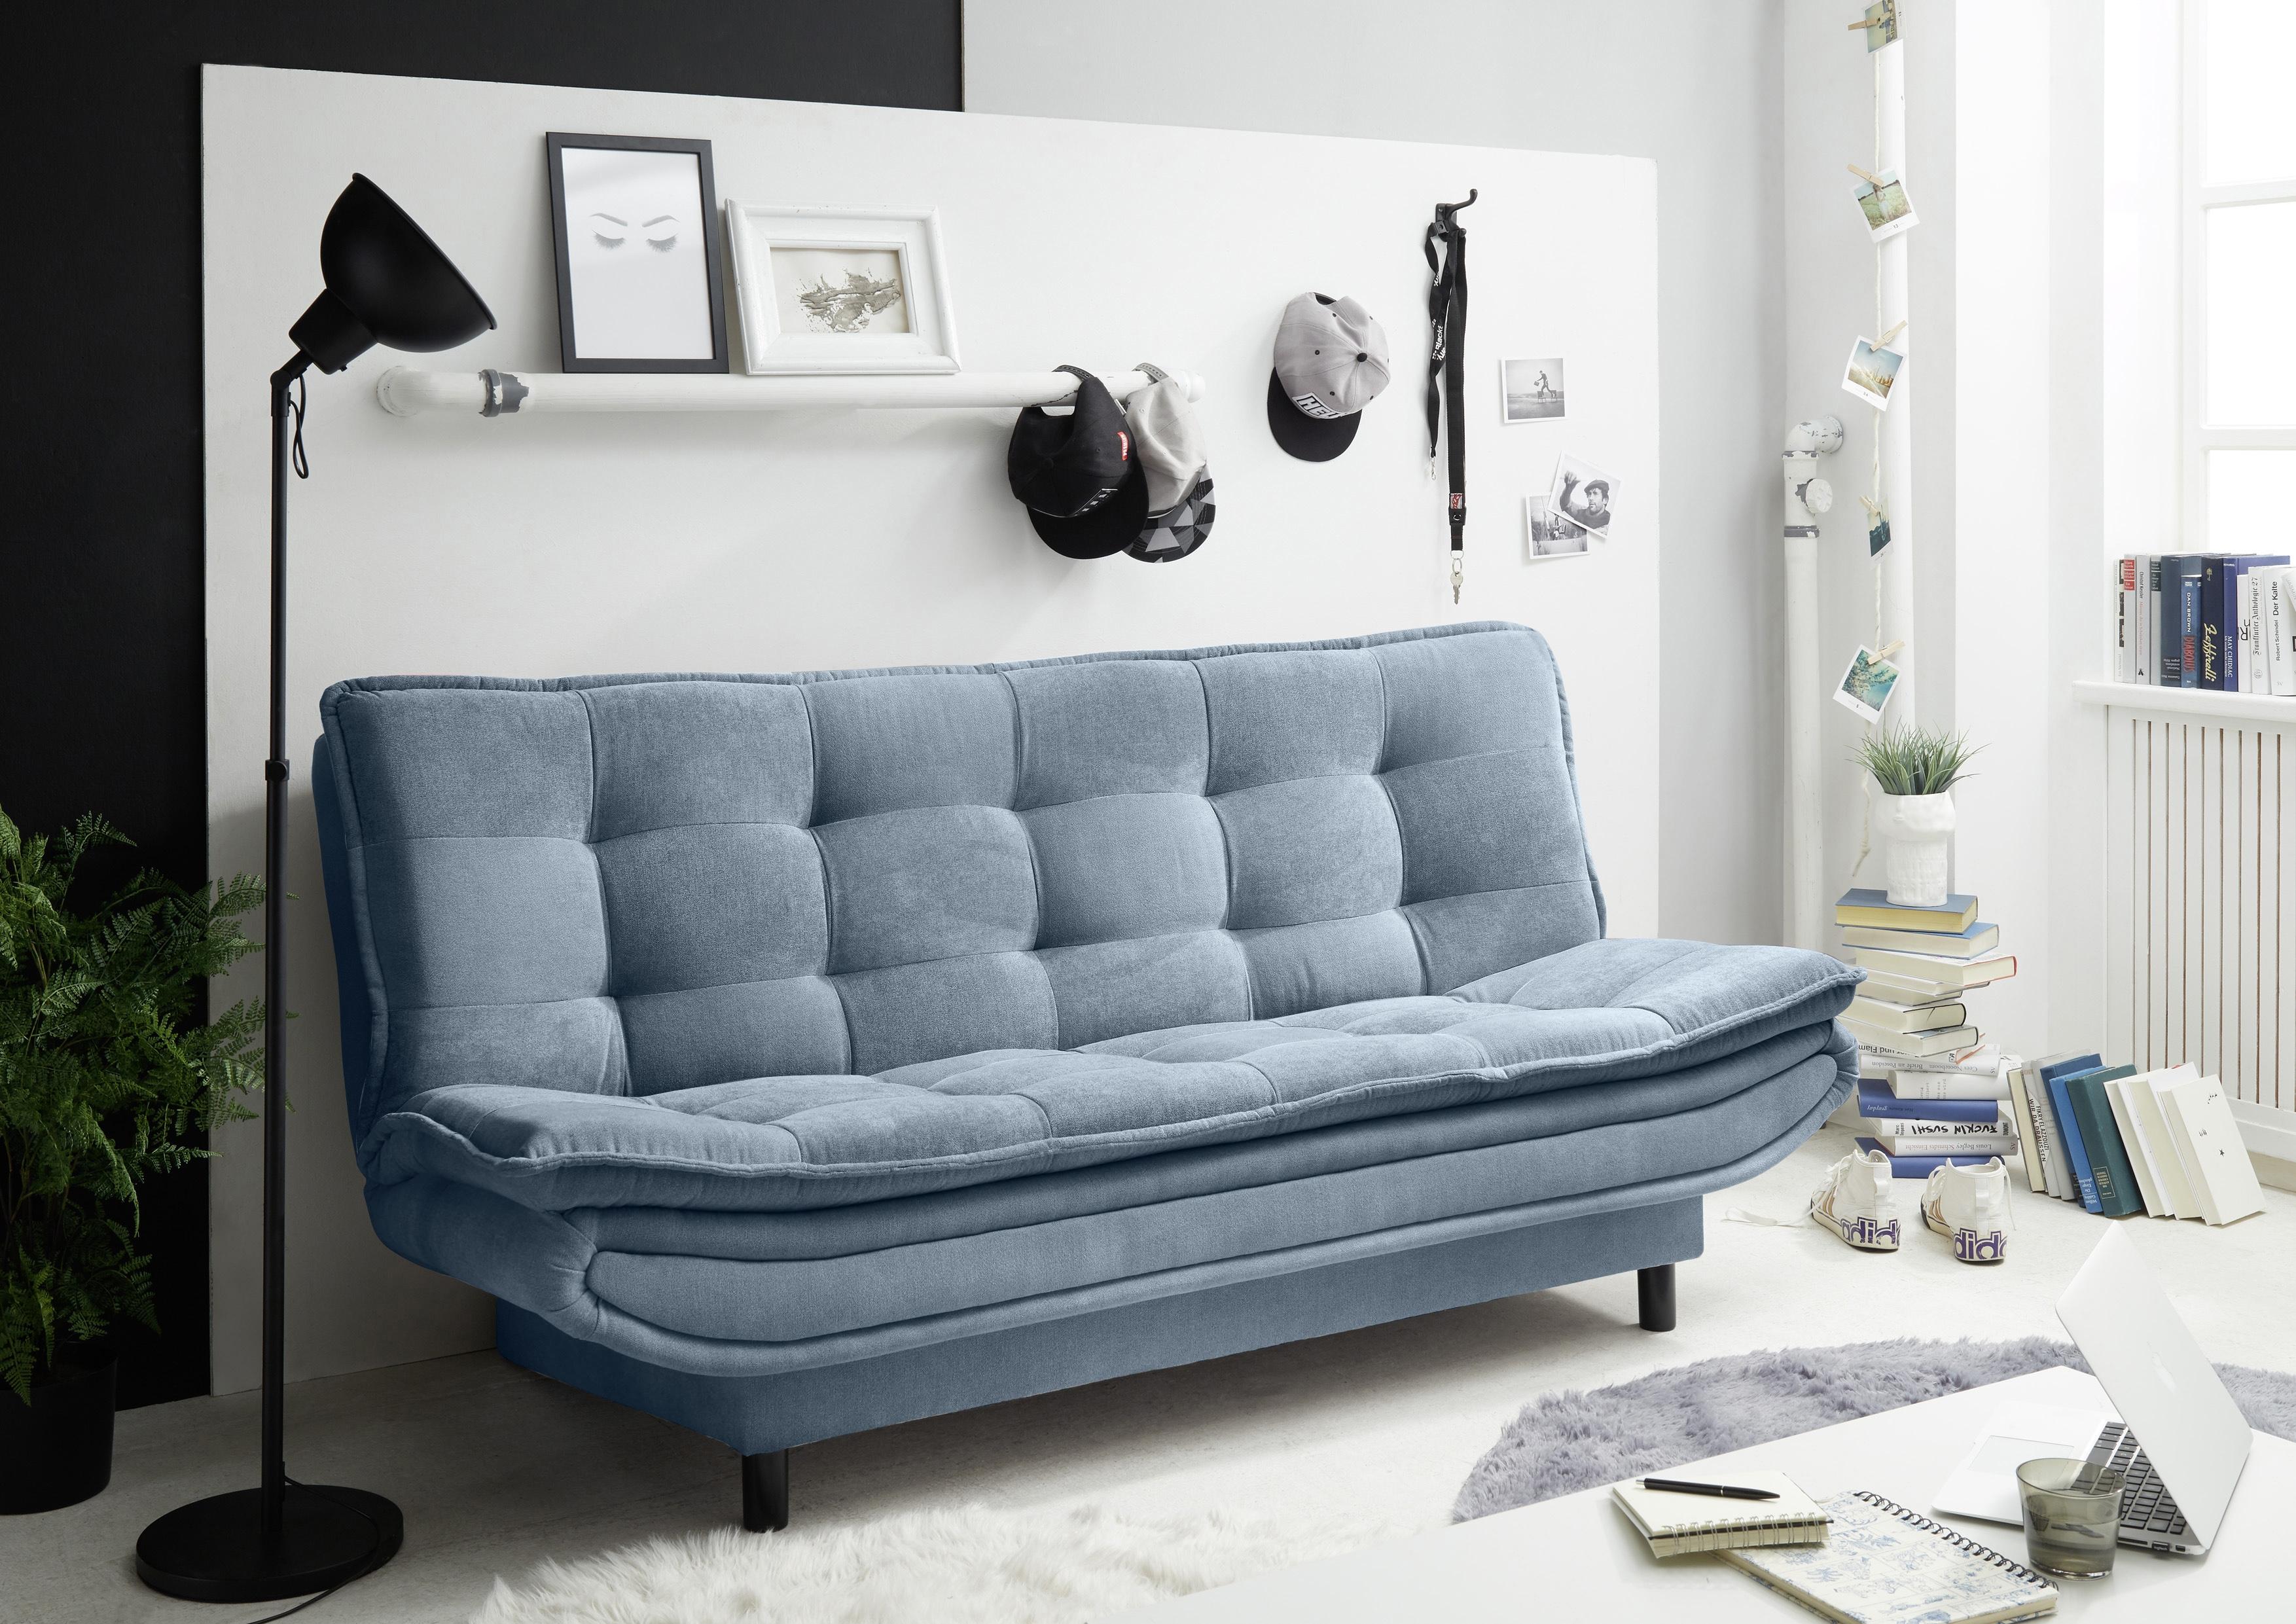 Canapea extensibila tapitata cu stofa, 3 locuri Patris Albastru, l188xA89xH90 cm